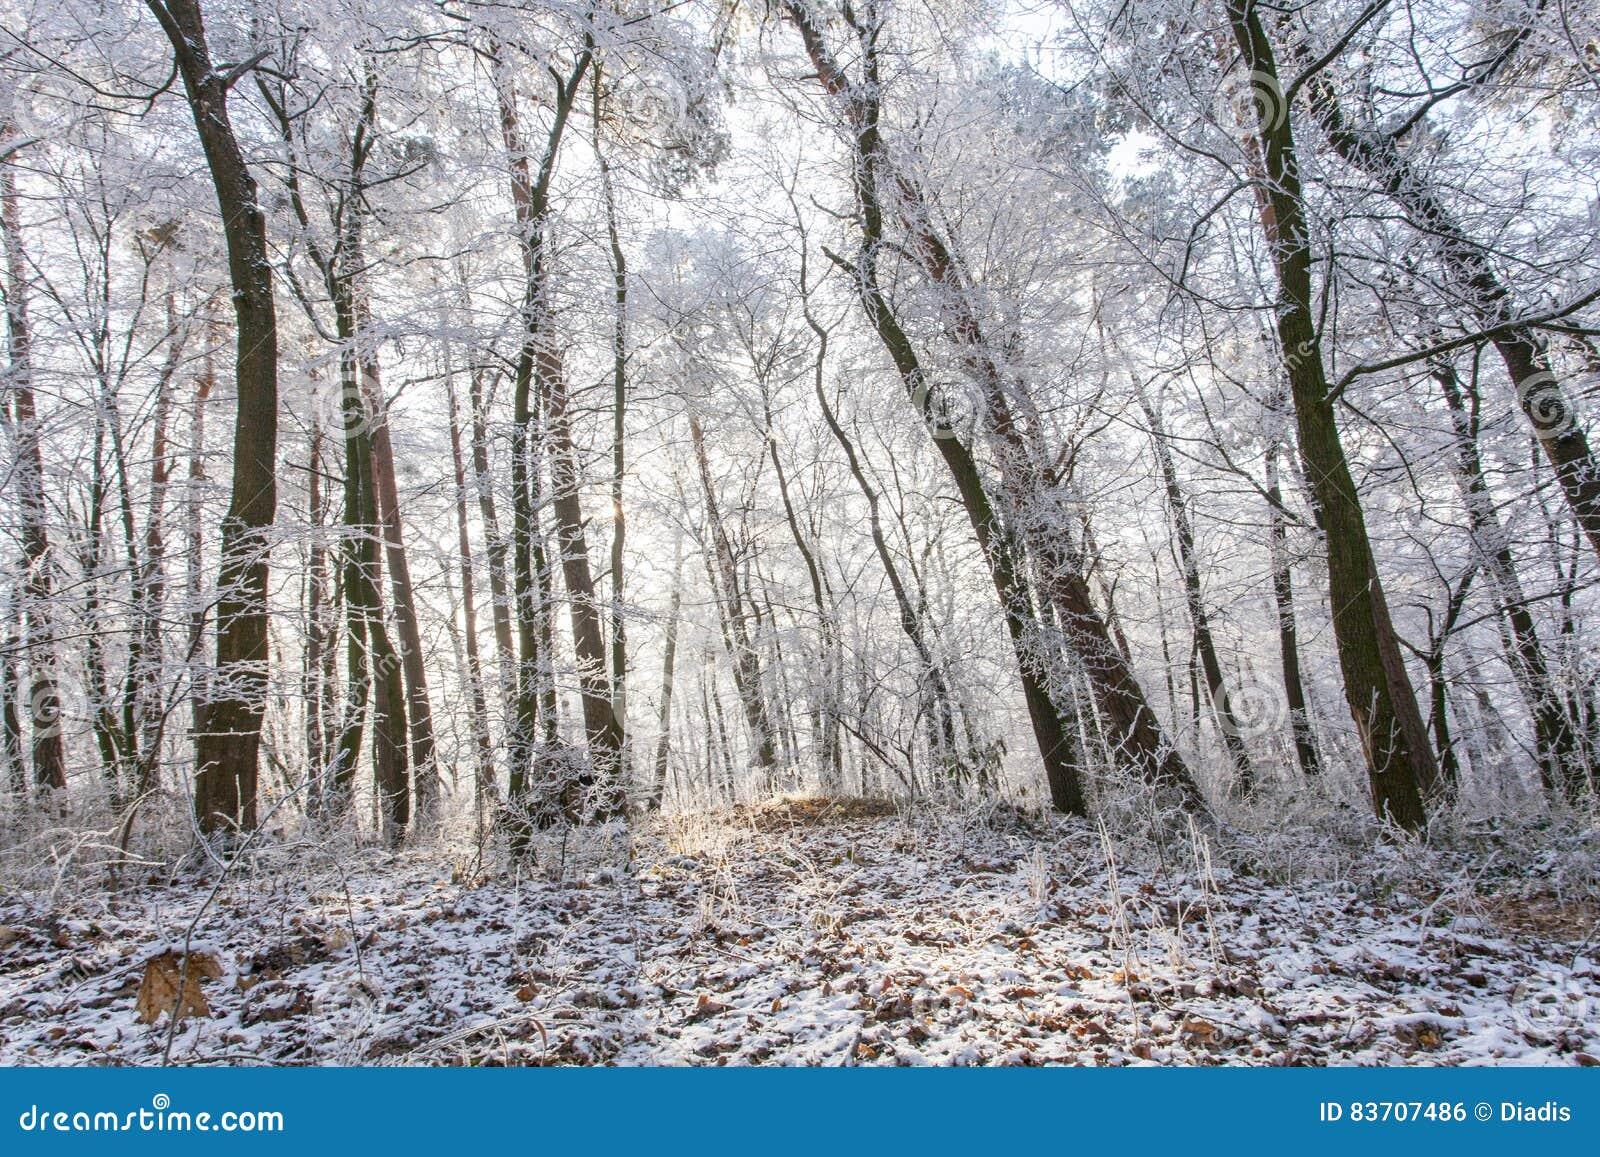 White Frozen Winter Magic Forest Landscape In The Morning Light Stock Photo